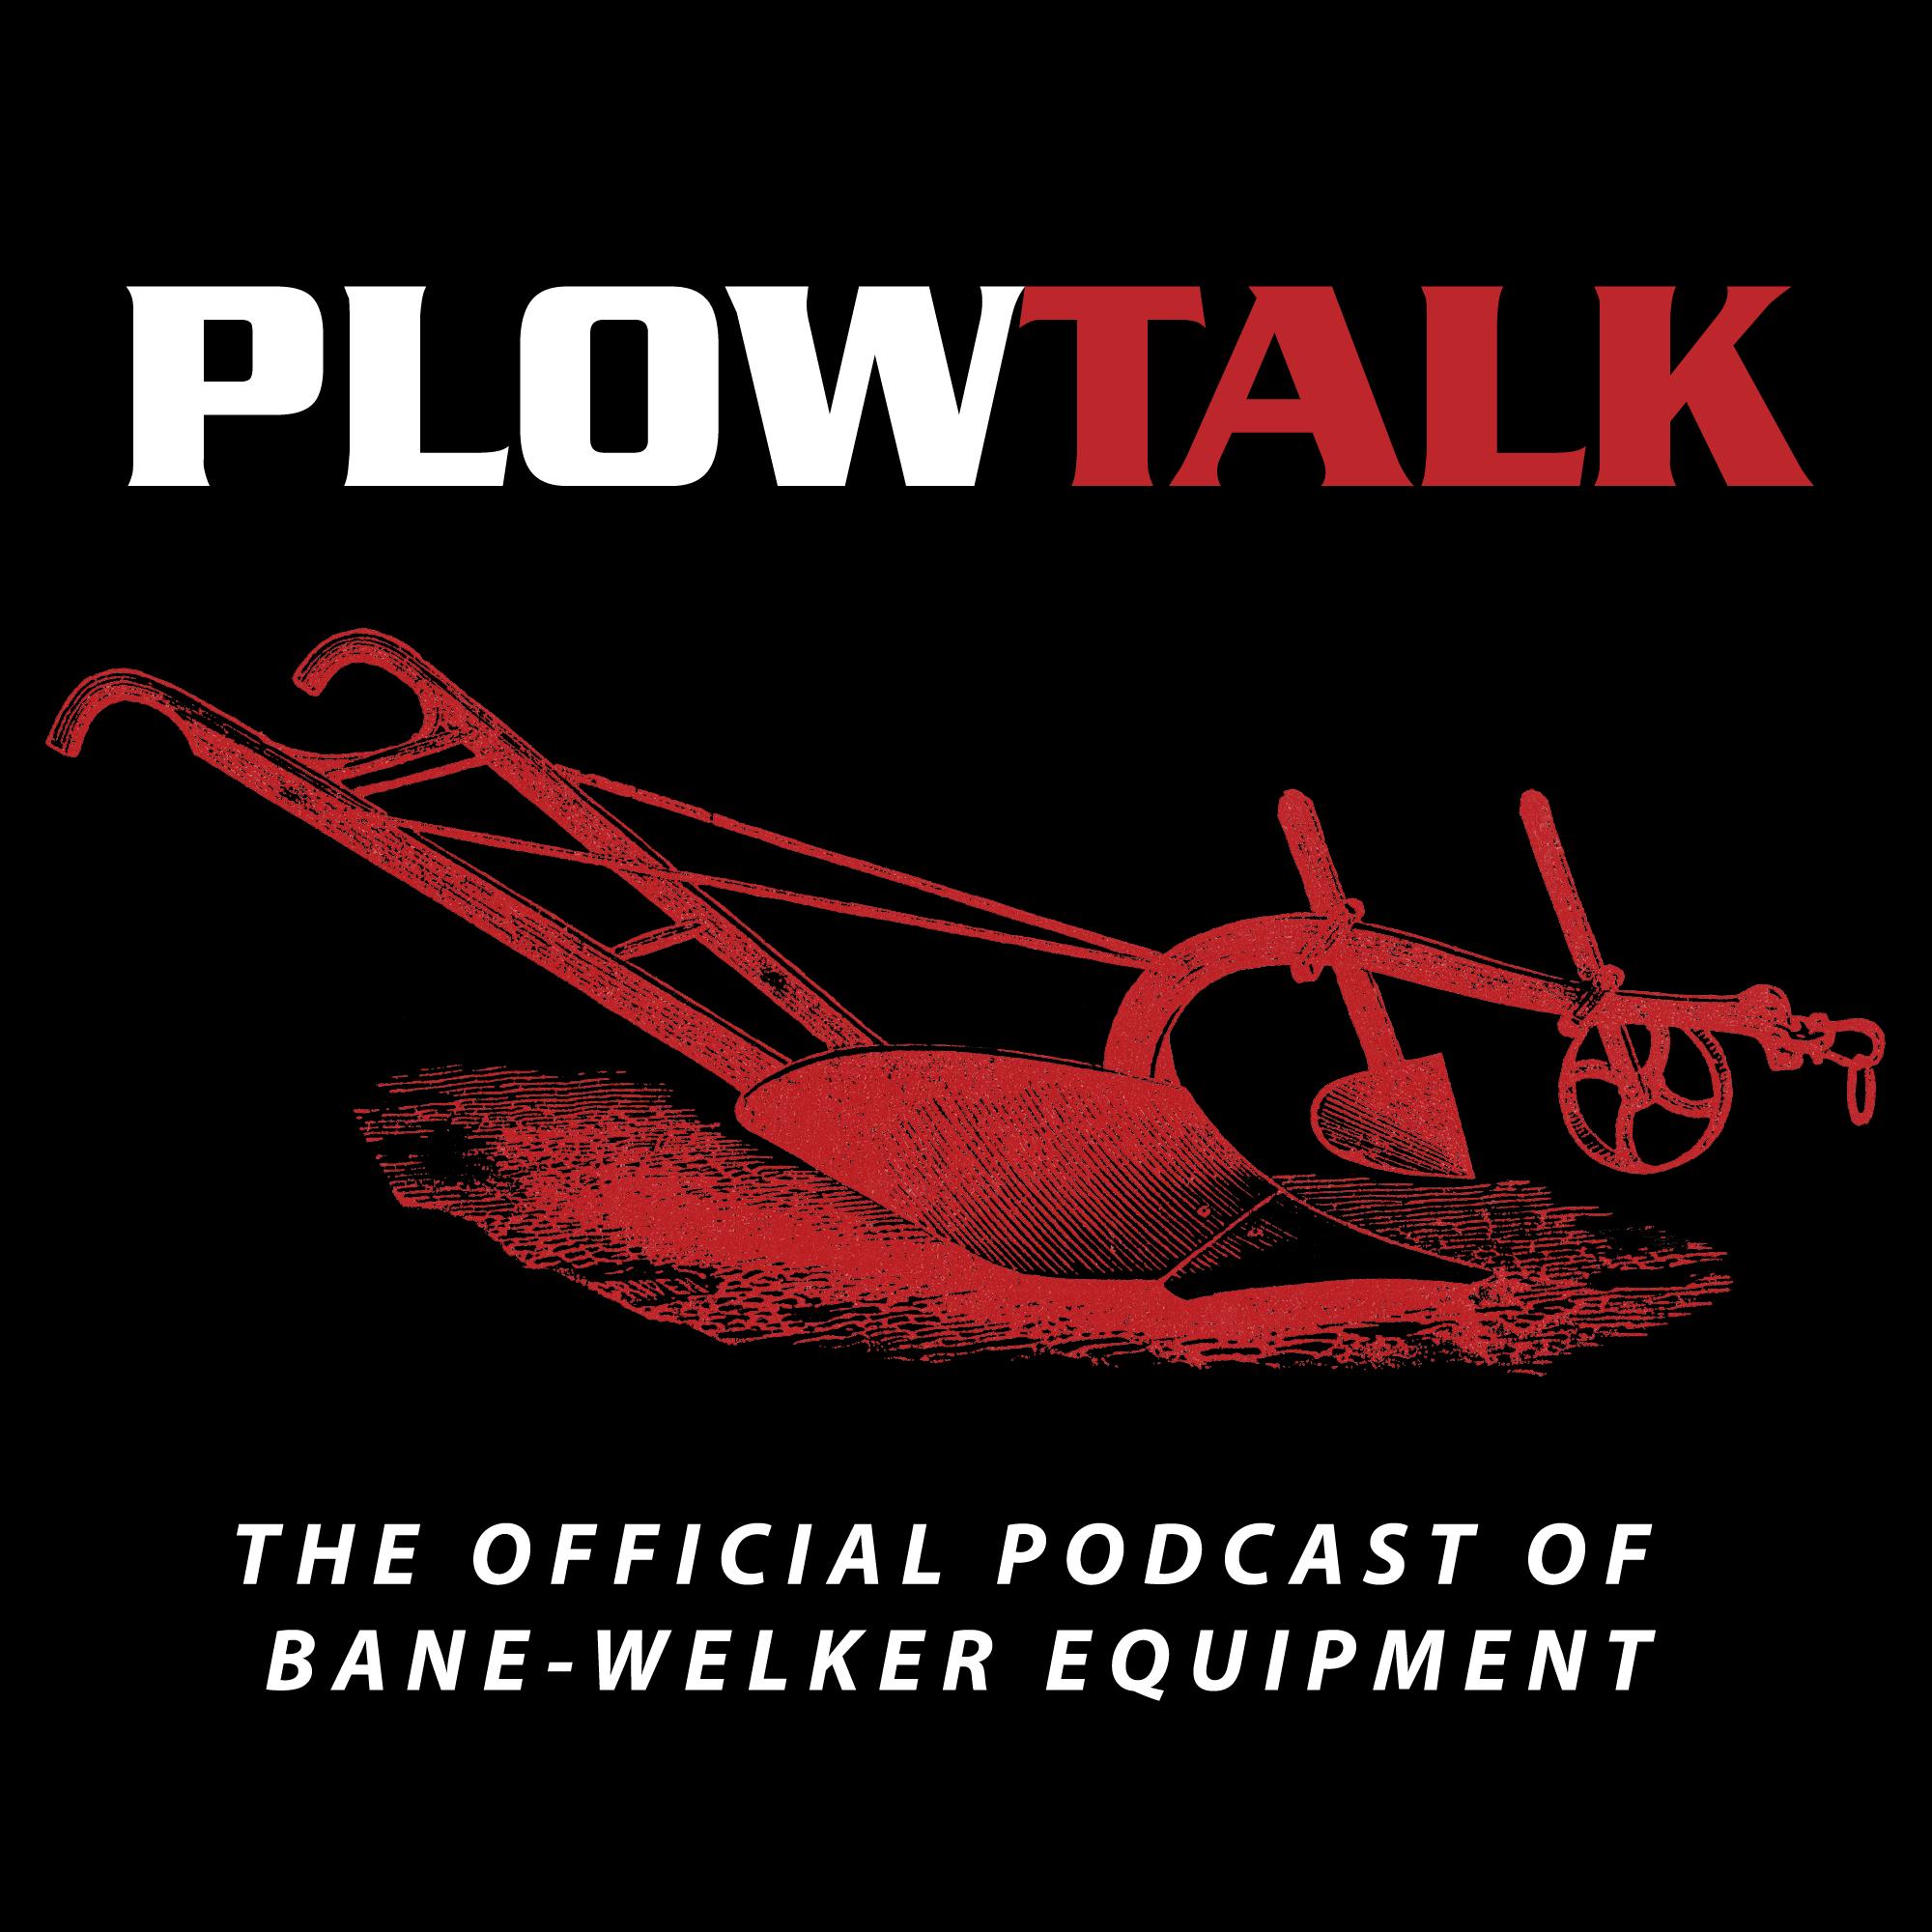 Plowtalk show art